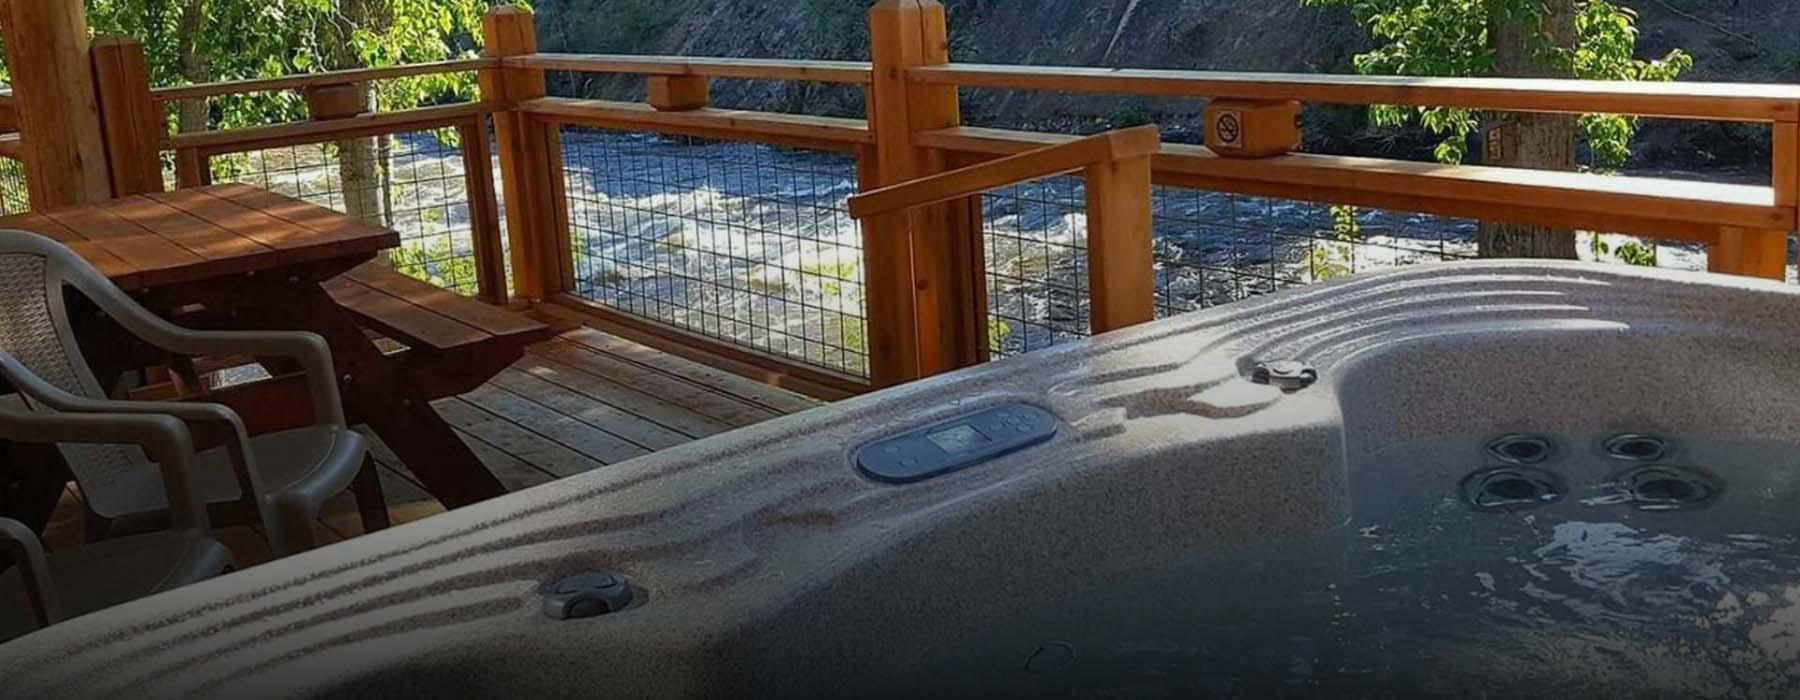 Hot Tub at River's Edge Resort